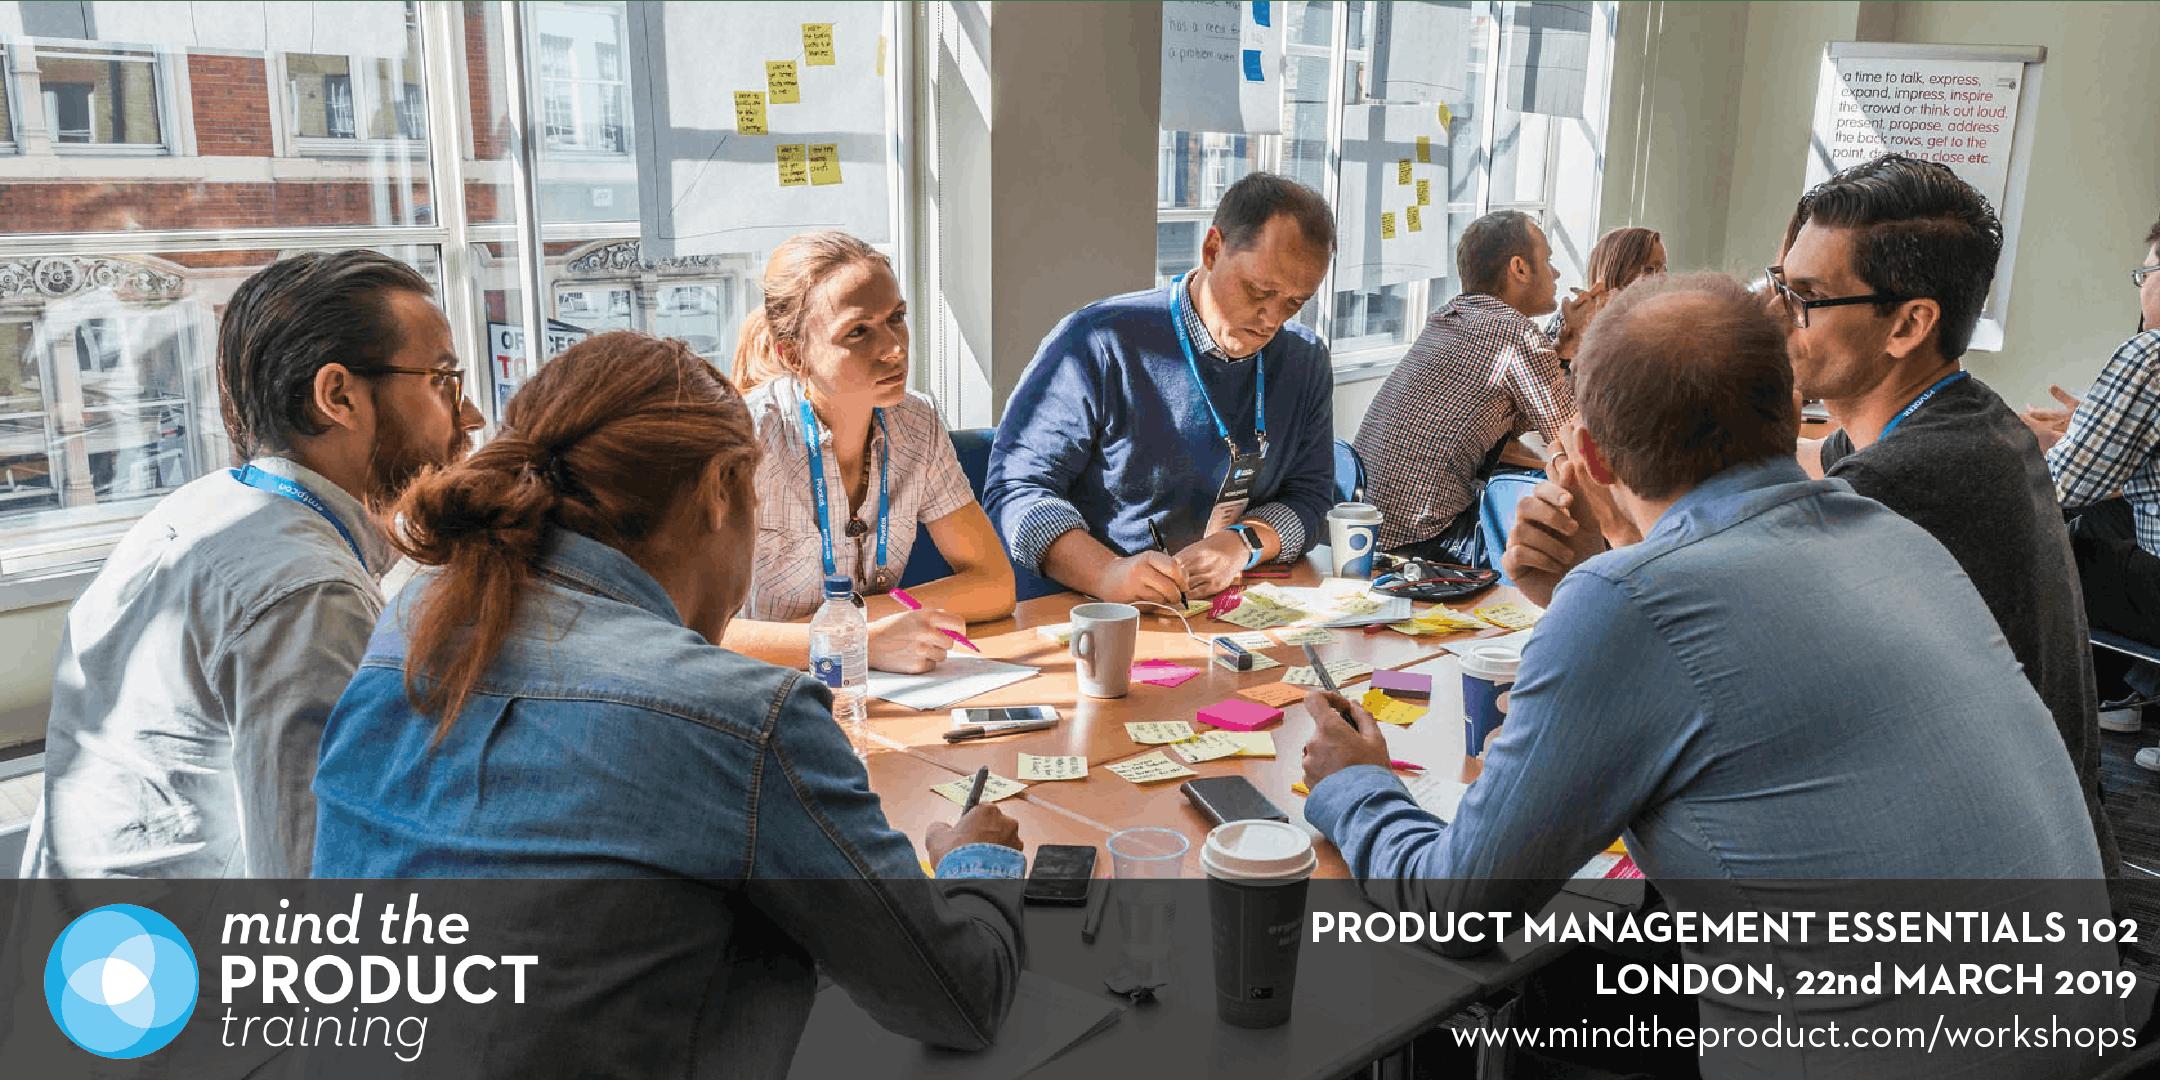 Product Management Essentials 102 Training Workshop - London